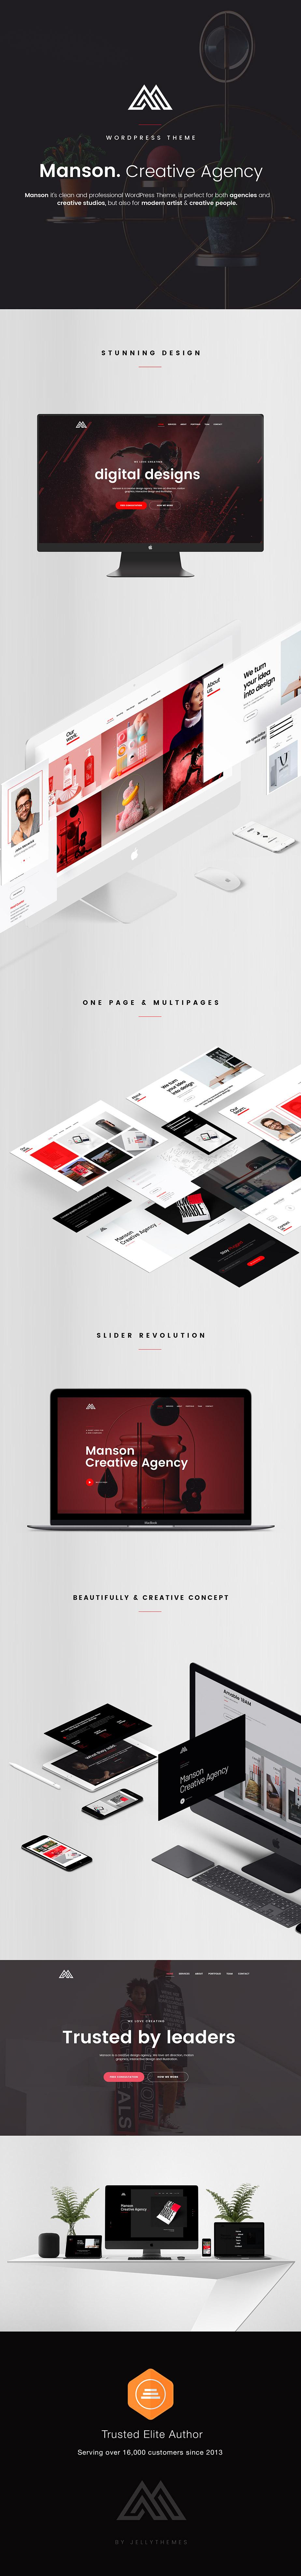 Manson - Creative Agency WordPress Theme - 1